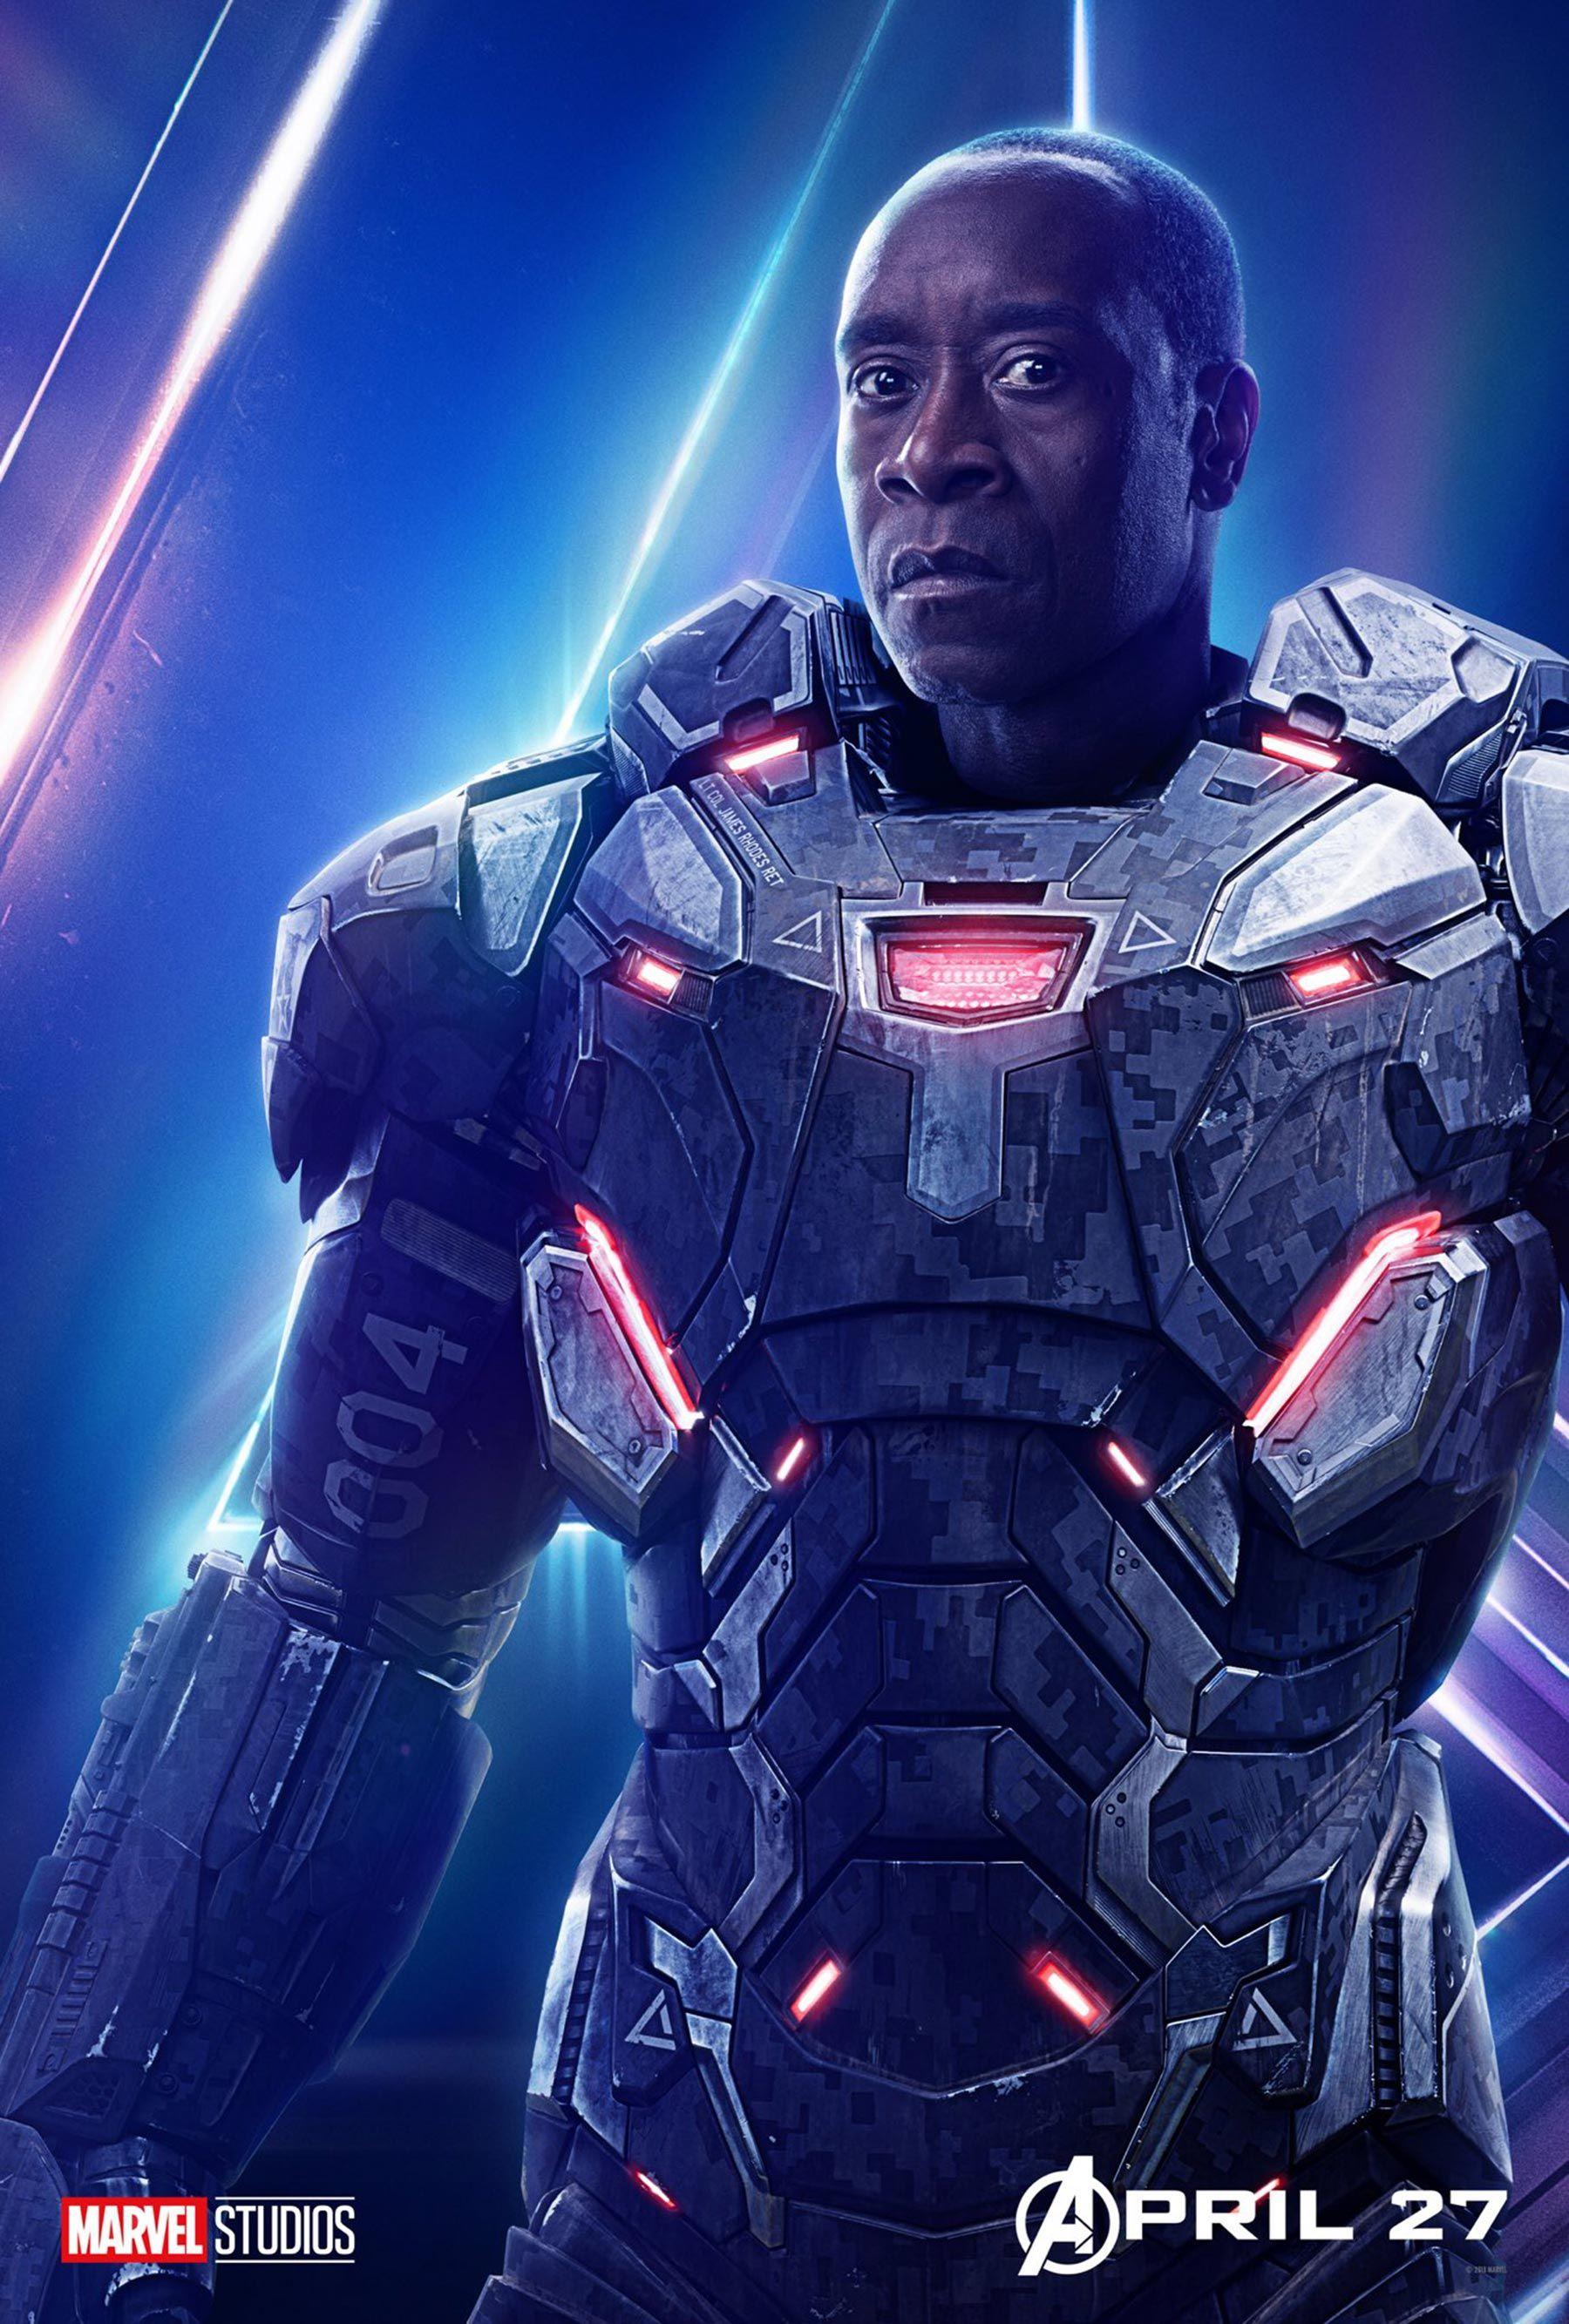 Avengers Infinity War Character Posters War Machine